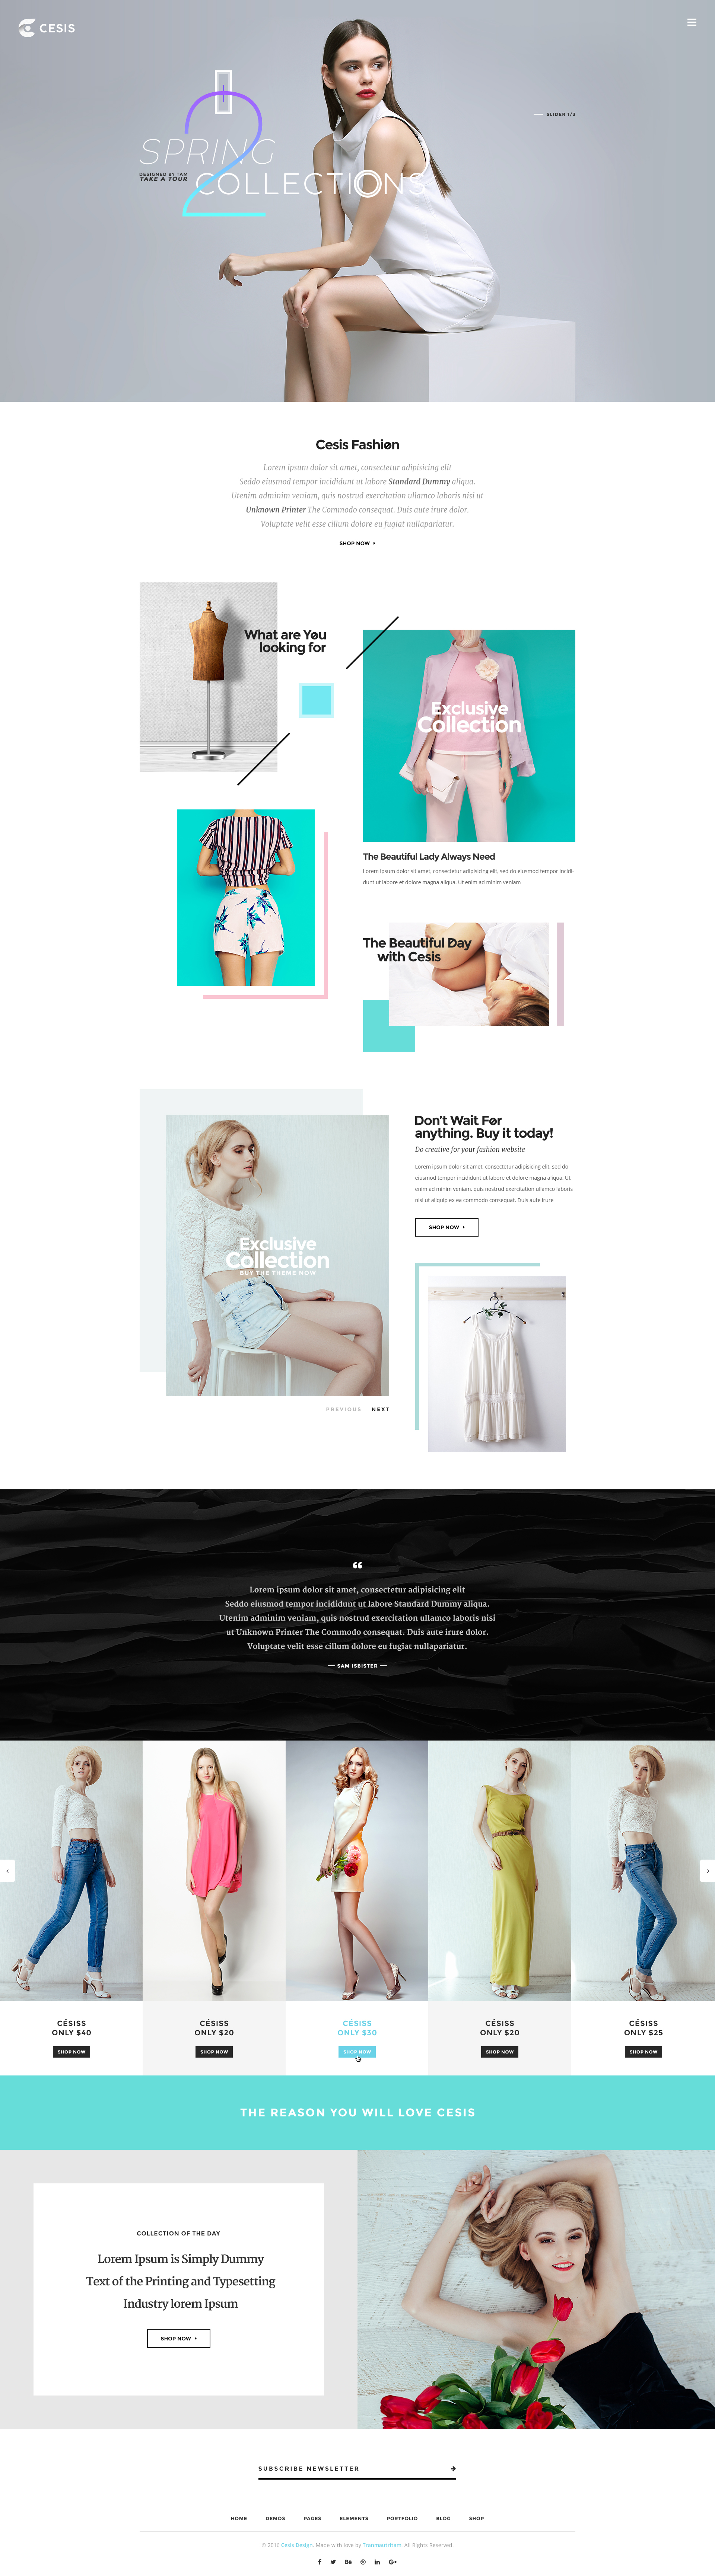 Cesis | Ultimate Multi-Purpose PSD Template by